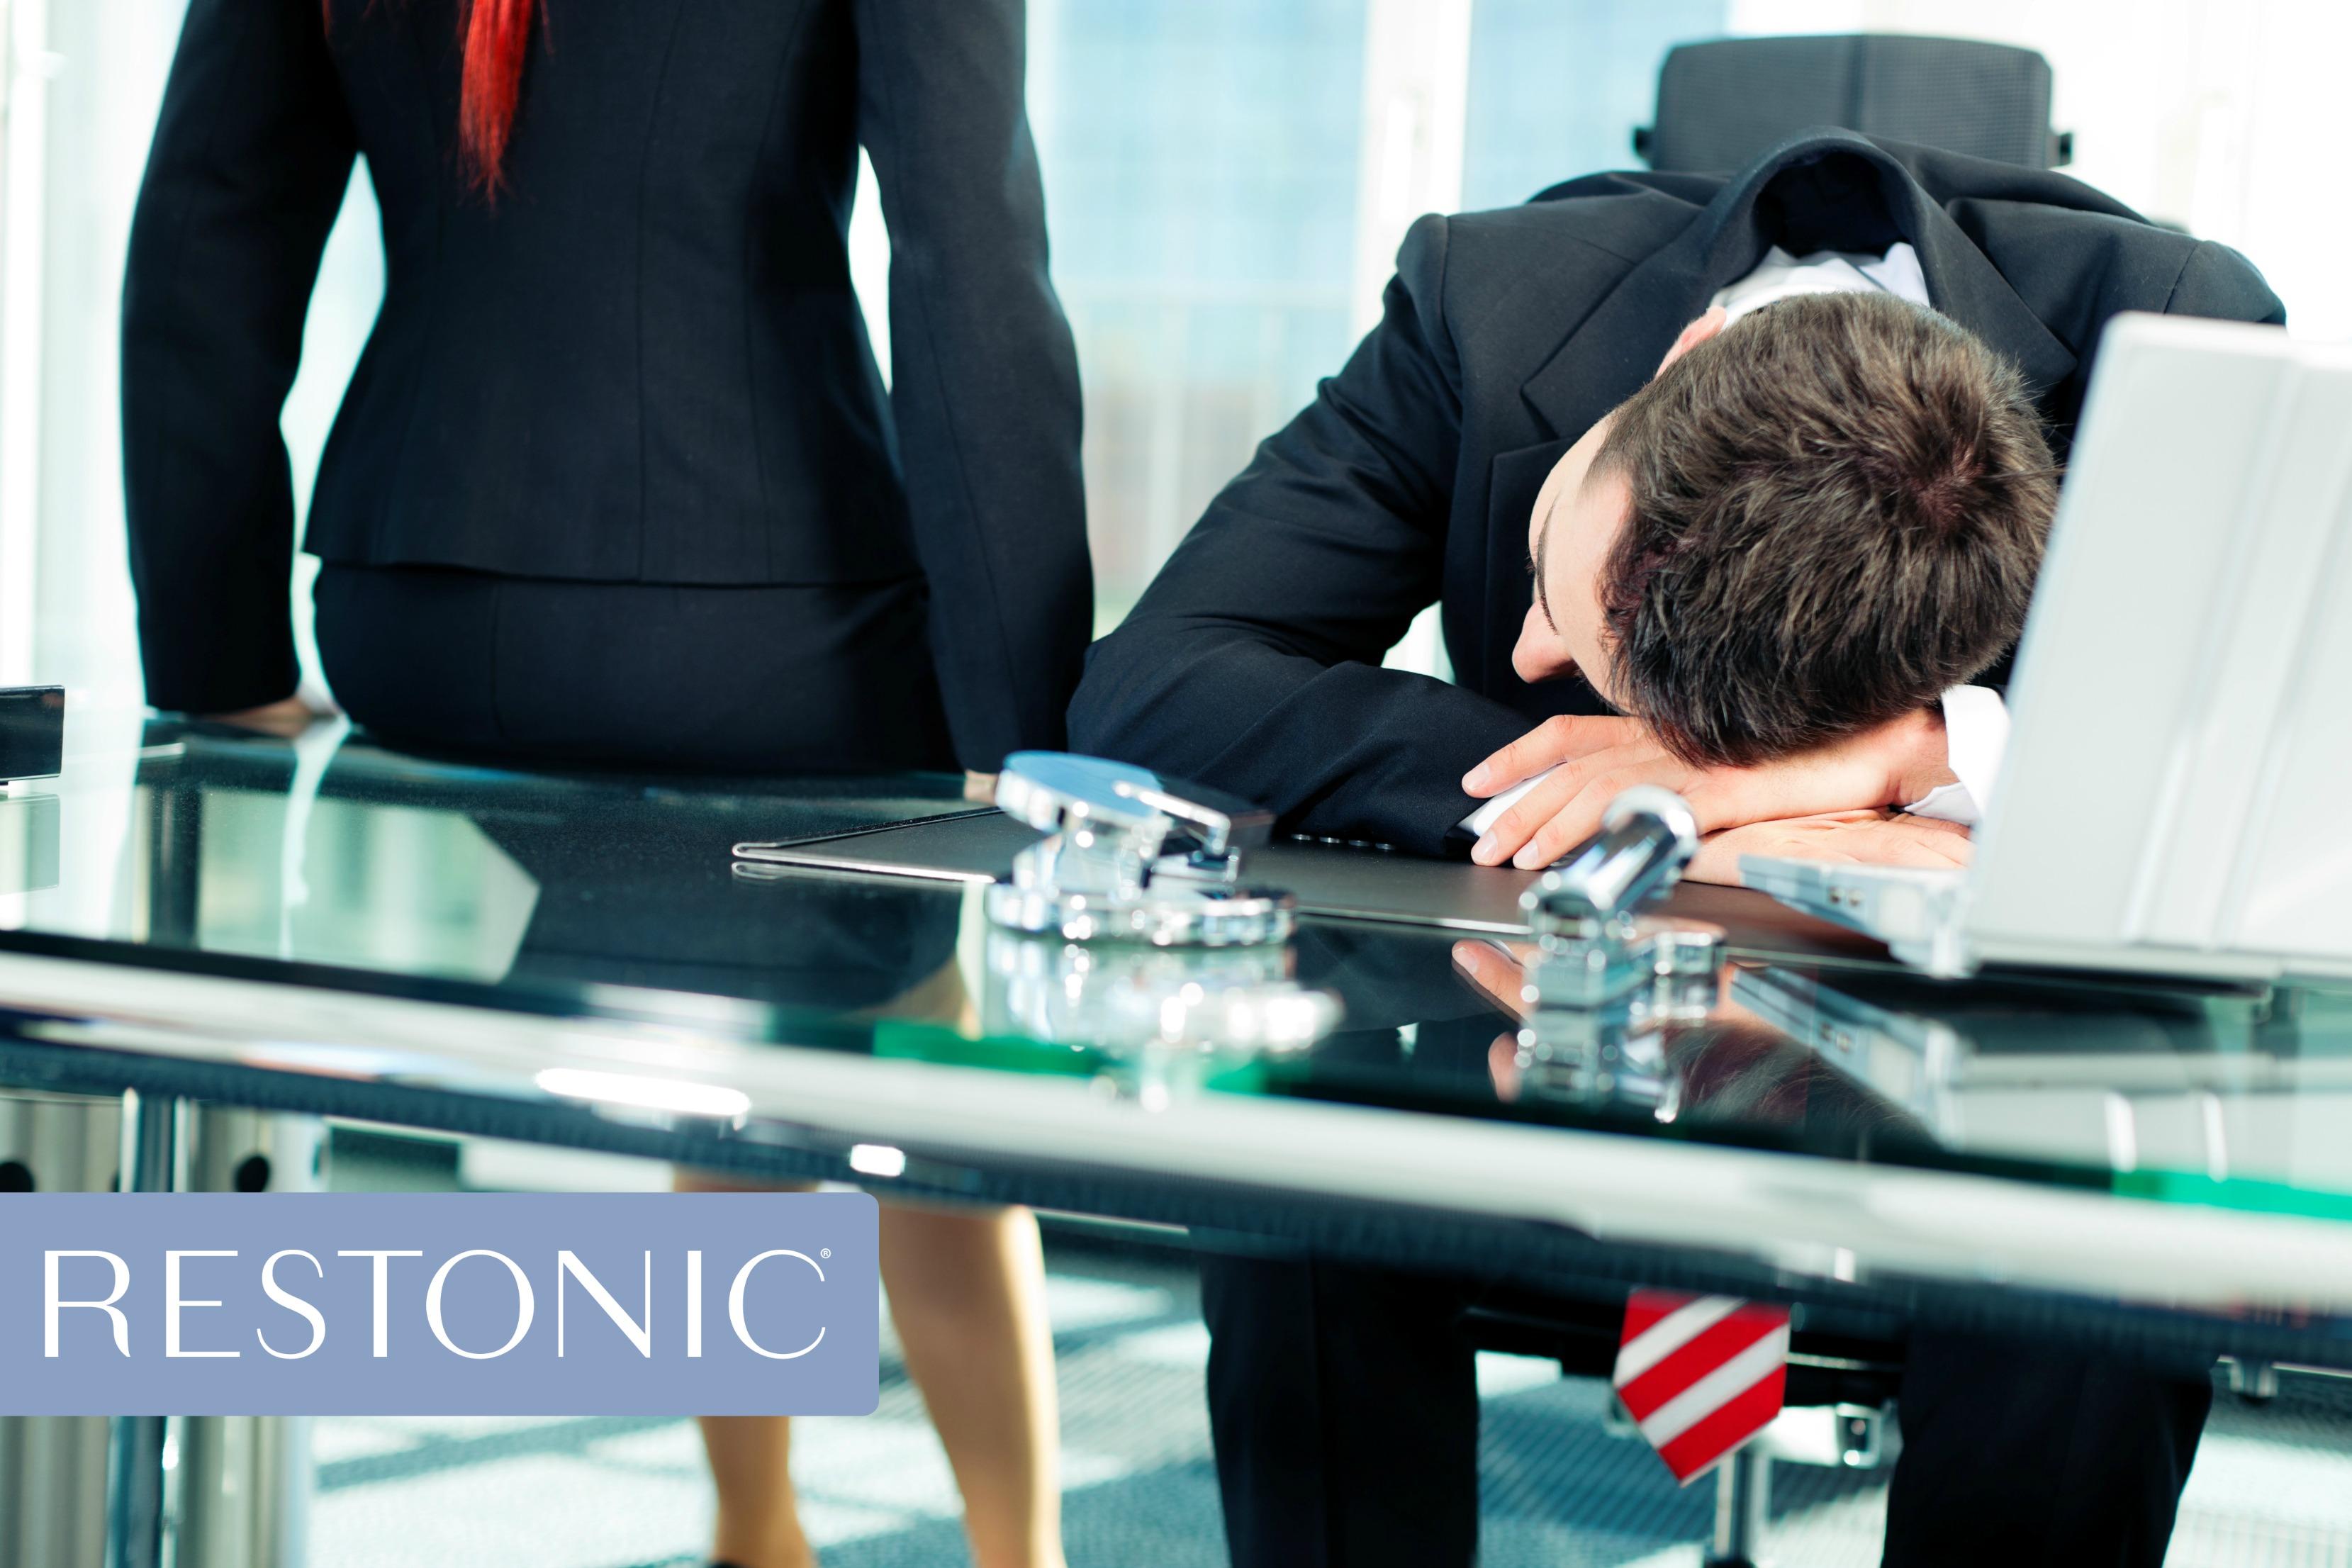 Man sleeping during a meeting